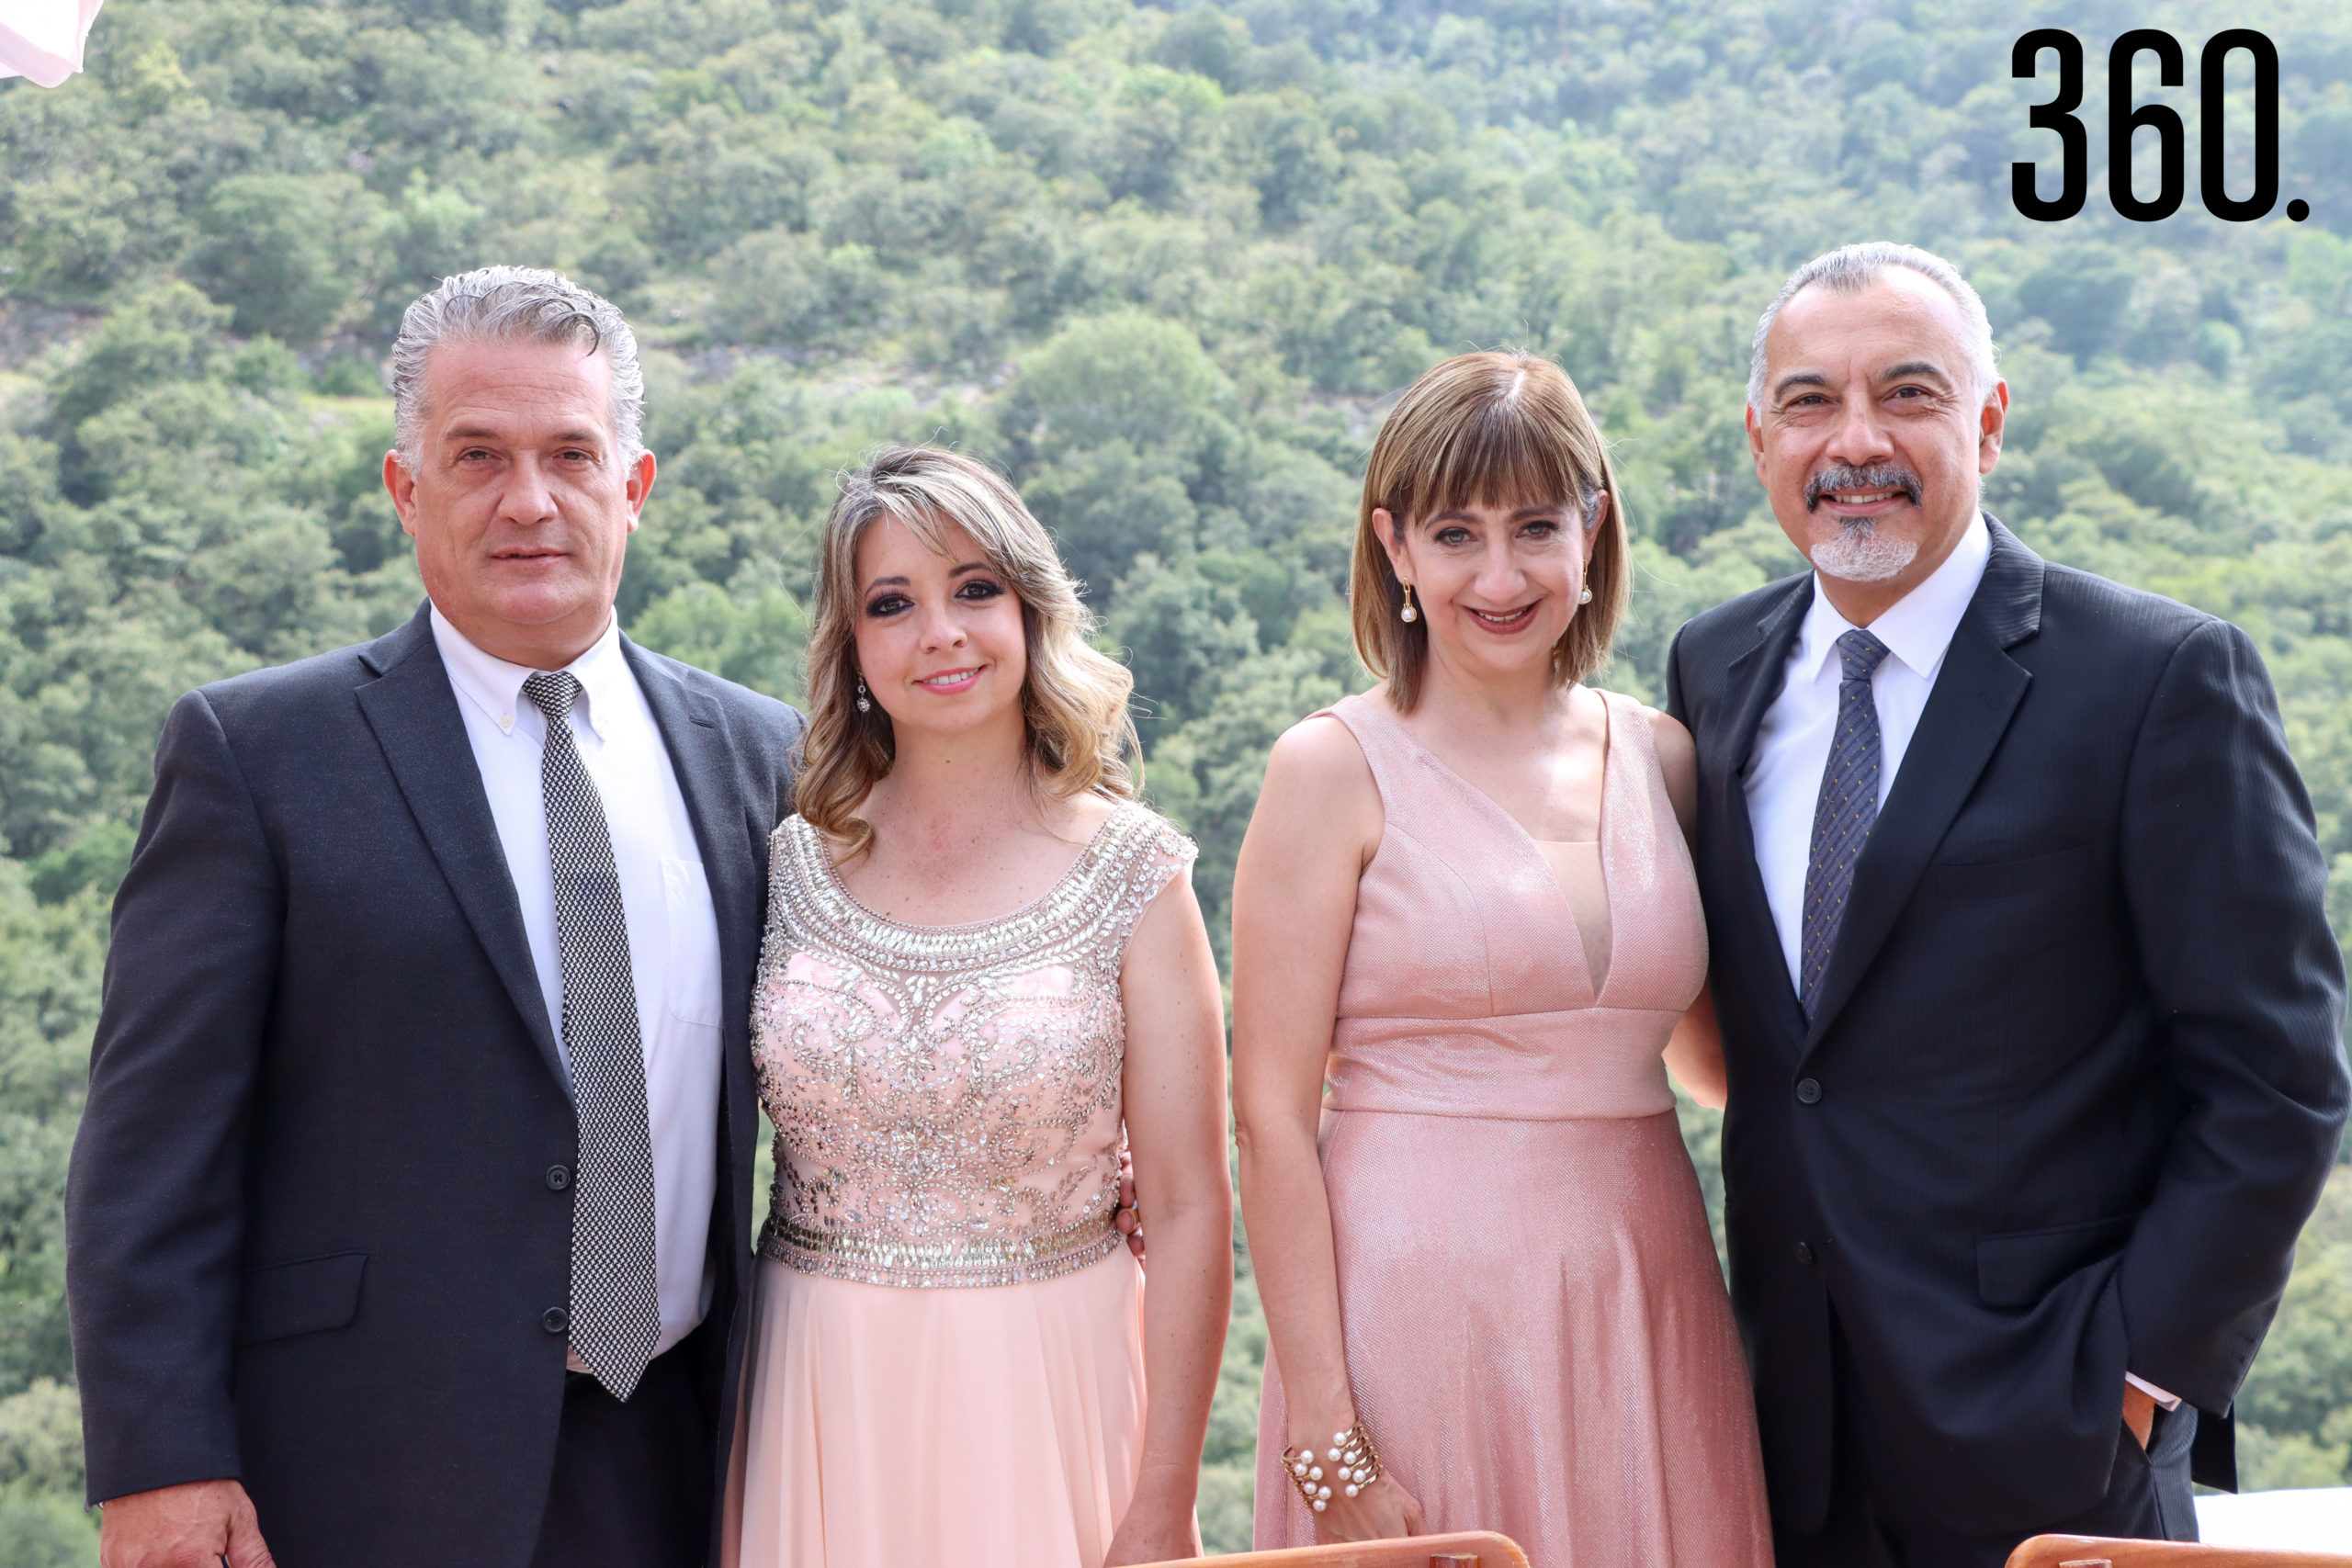 Humberto Castilla, Liliana Martínez, Marycarmen y Rubén Bernal.